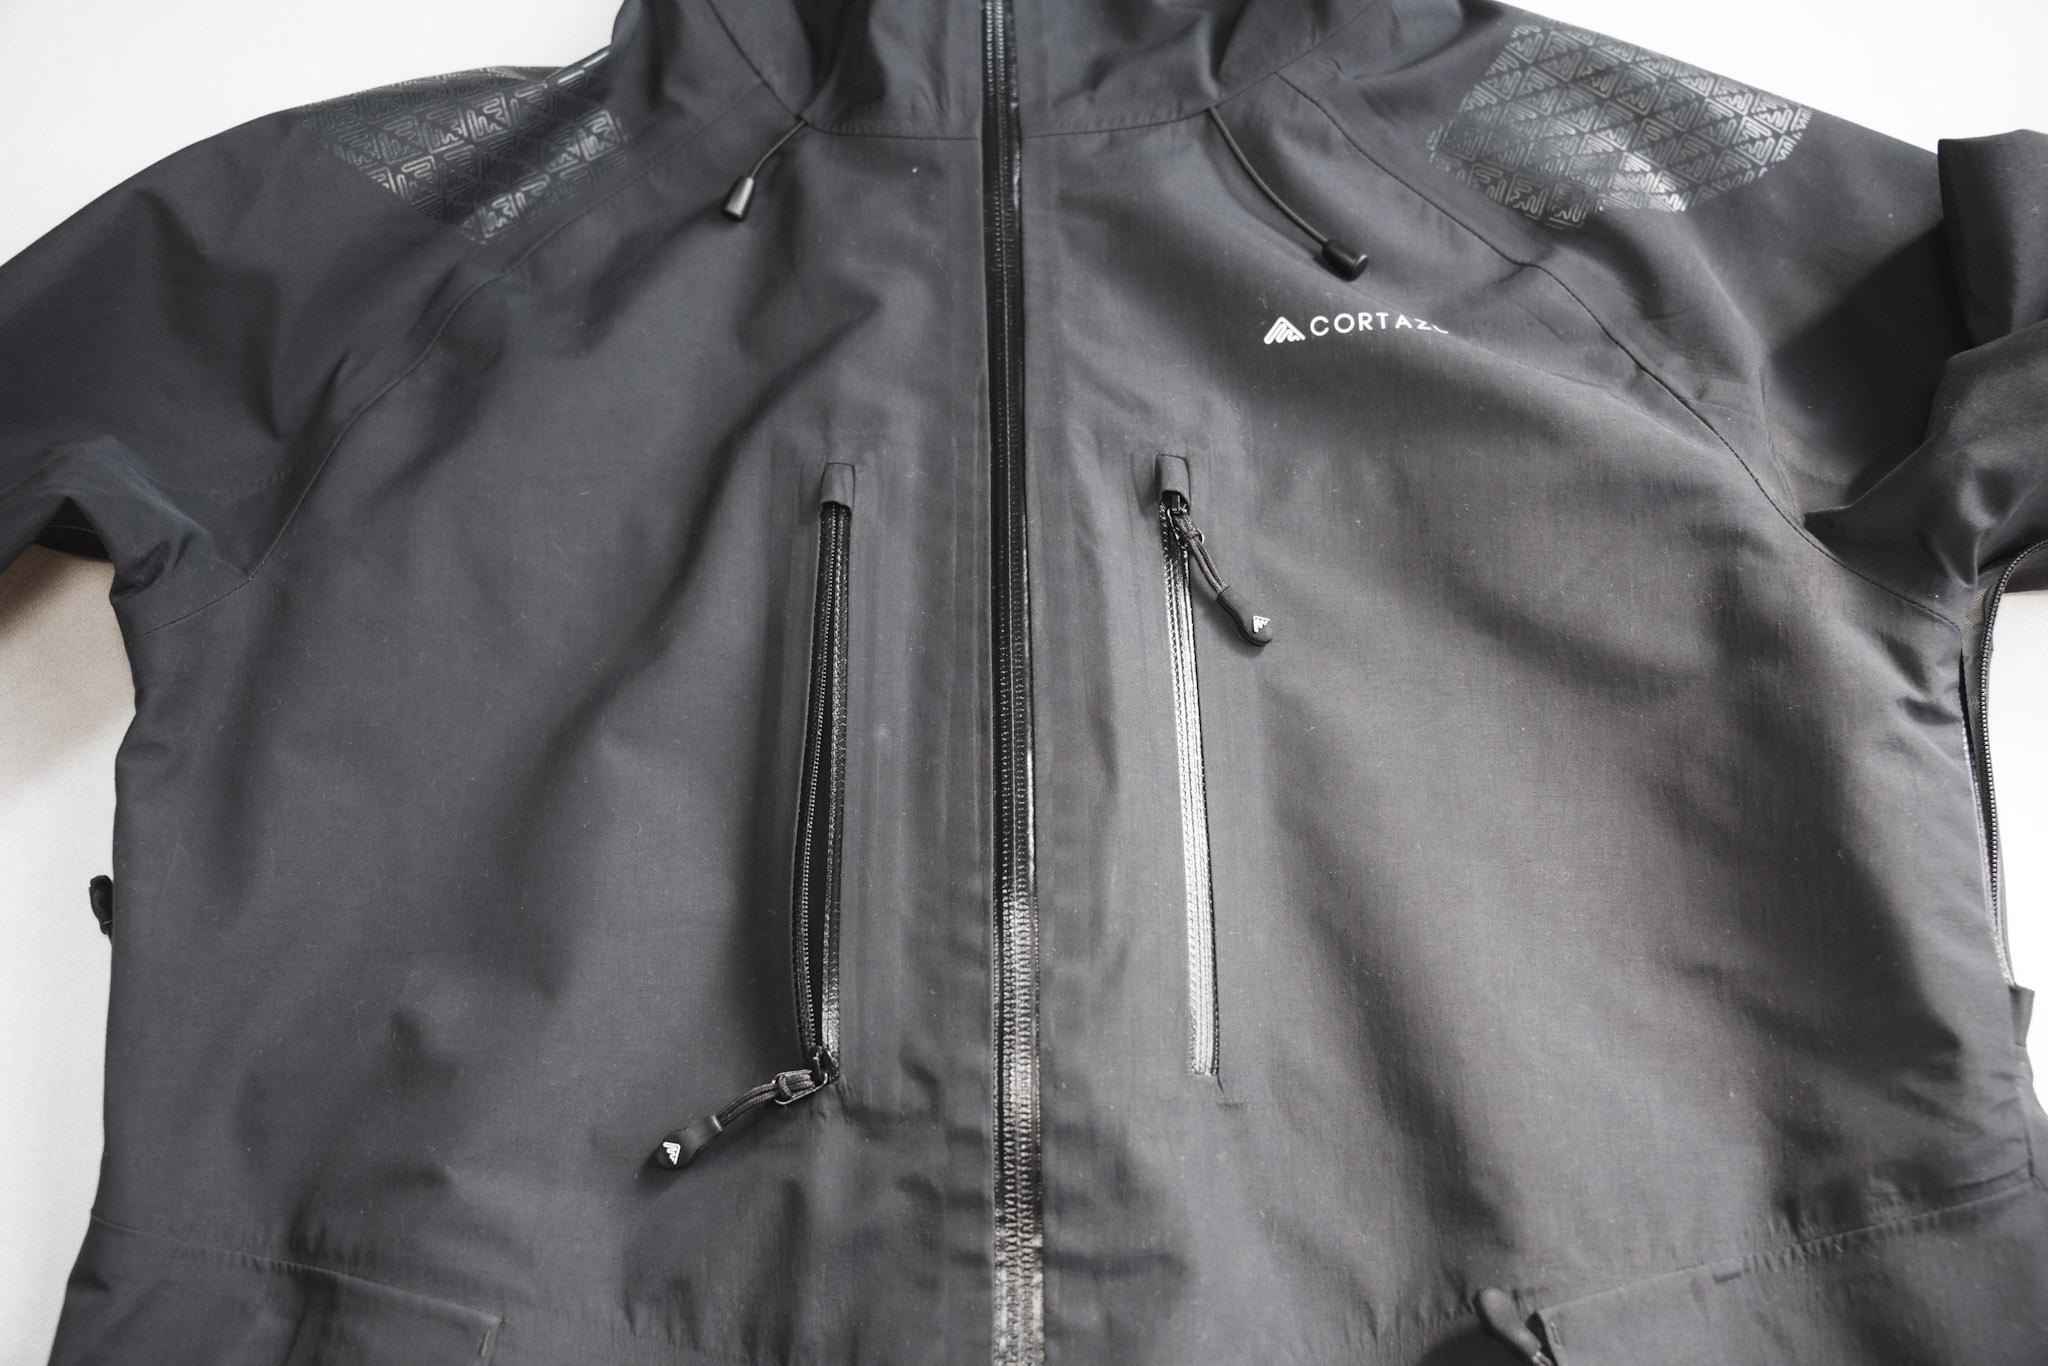 CORTAZU MOUNTAIN HARD SHELL|収納:用途別に考えられた豊富なポケット